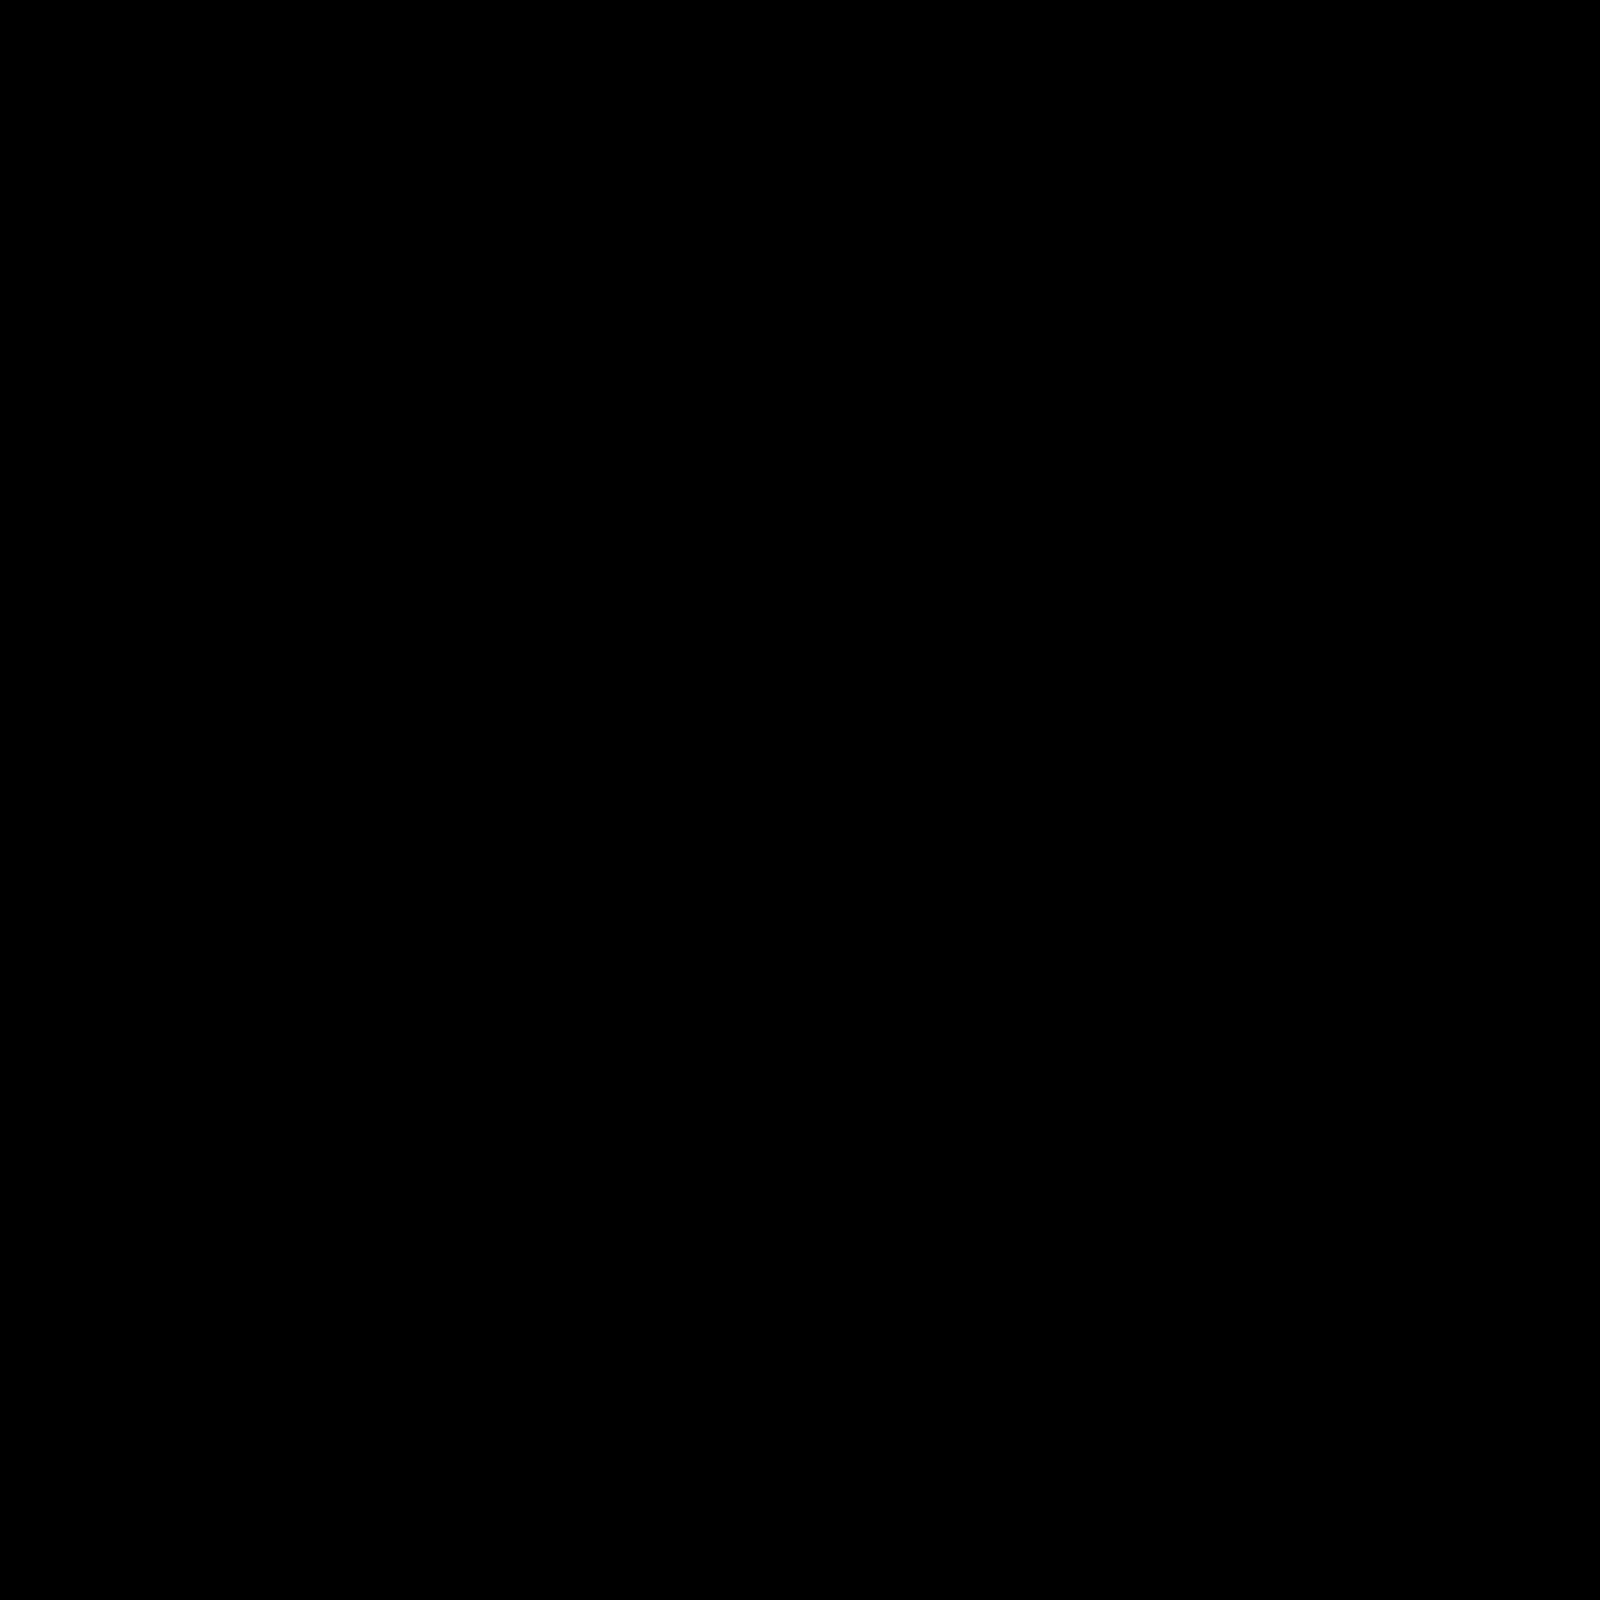 Shirts in Bulk icon